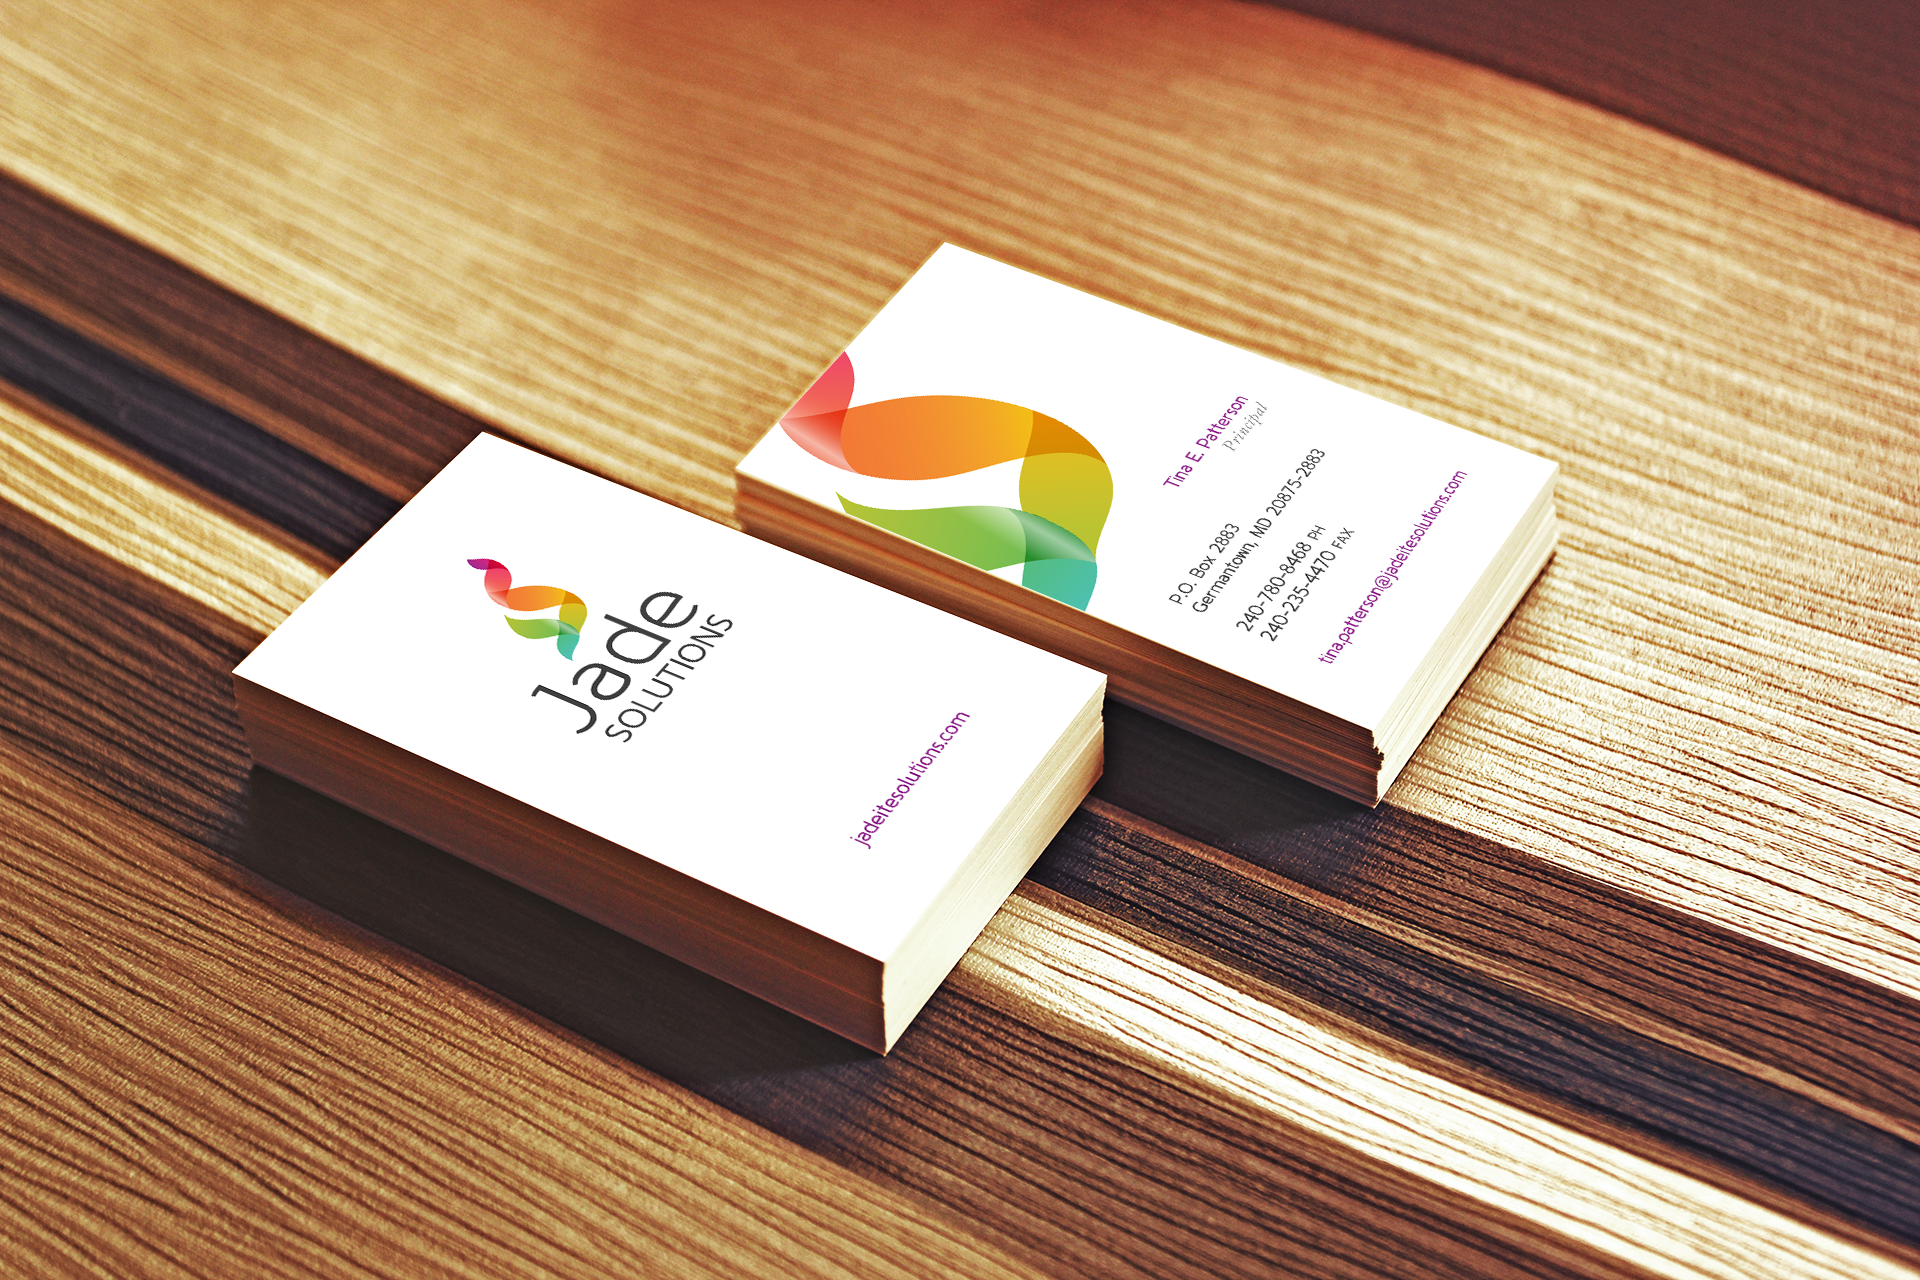 RafiQ Salleh-Flowers - Jade Solutions LLC